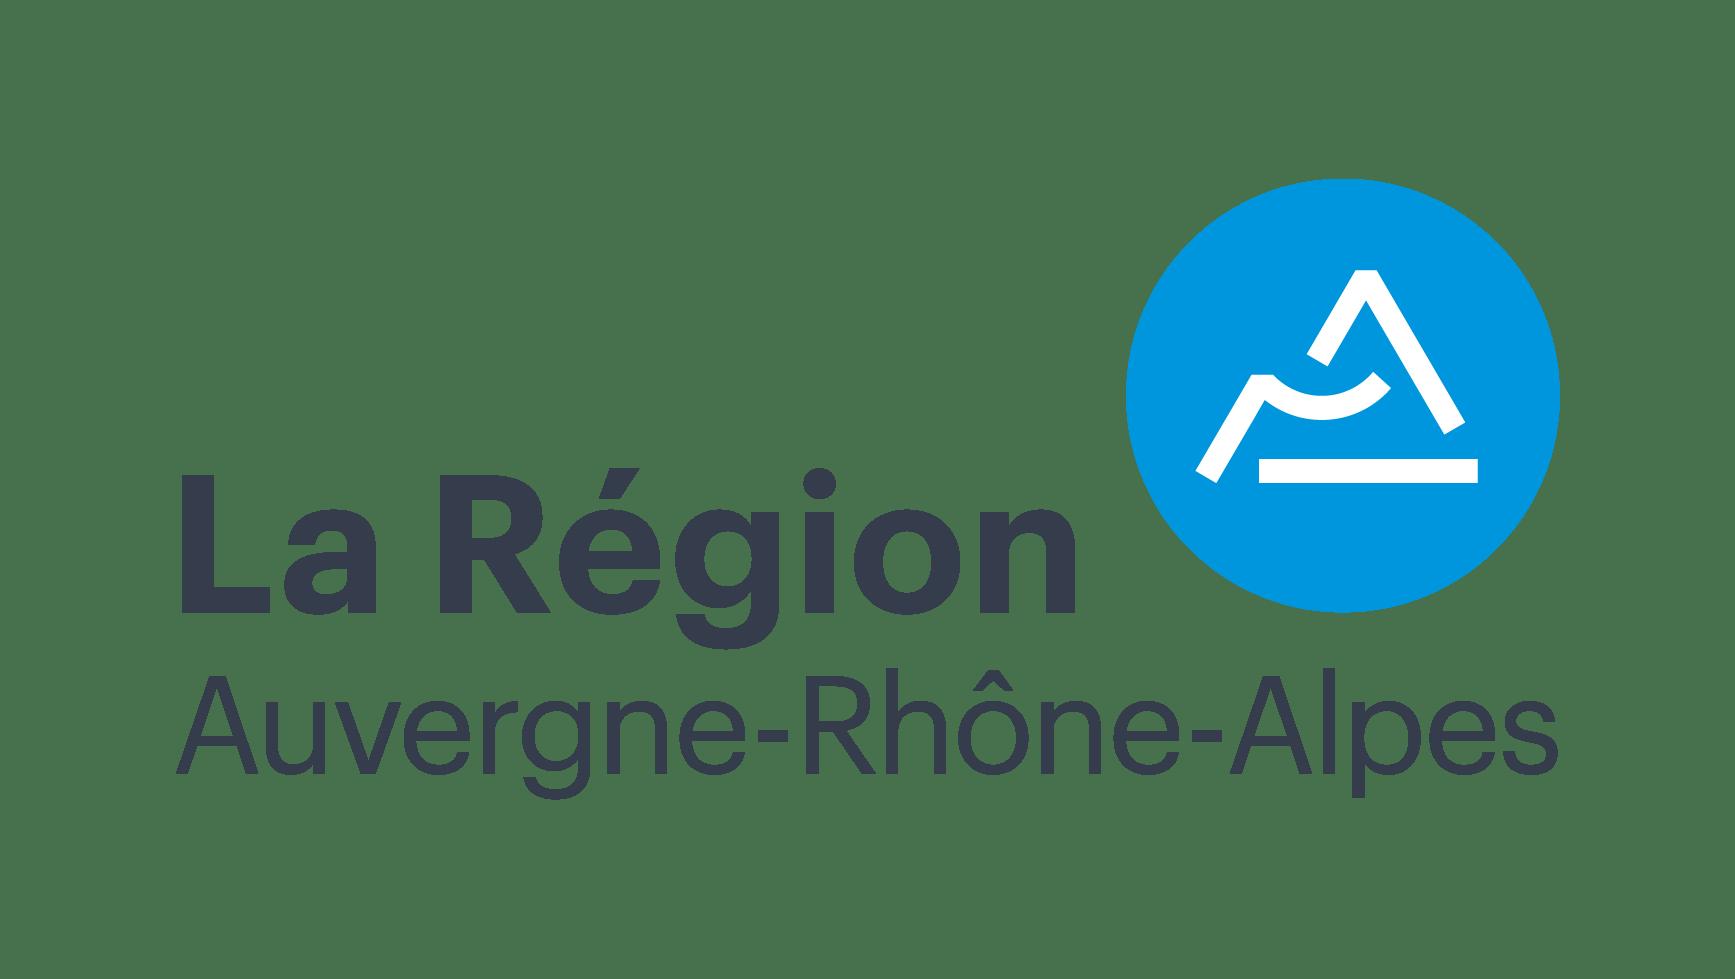 La région auvergne rhône alpes logo